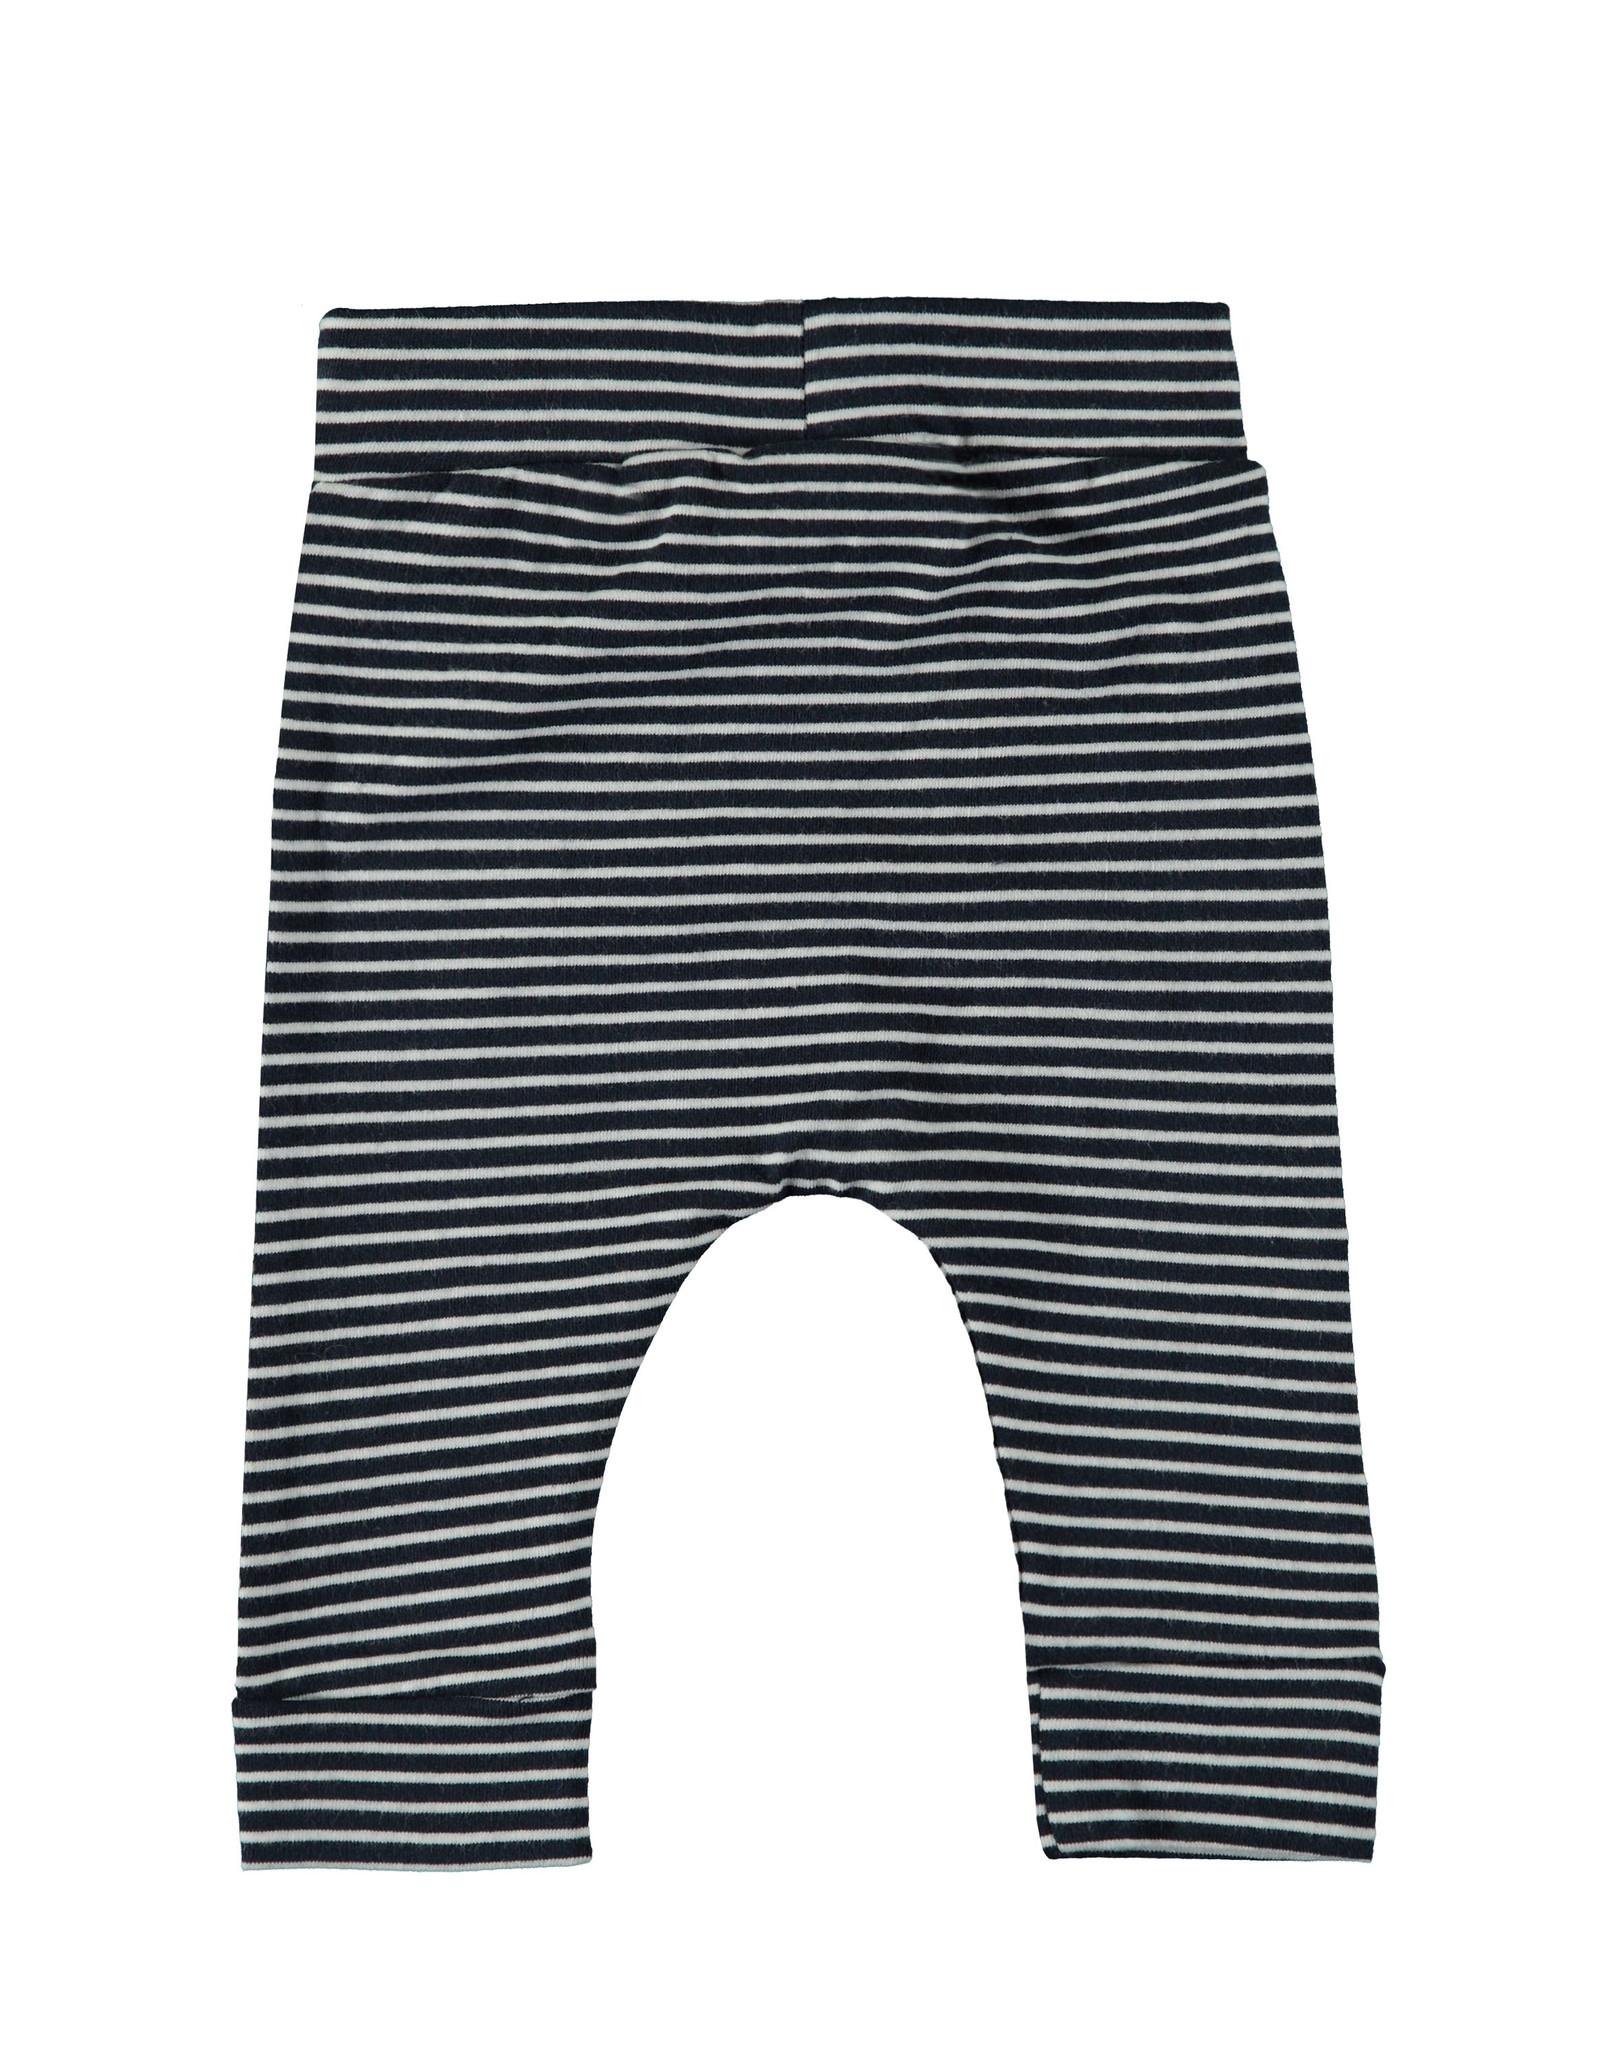 Bampidano Little Bampidano New Born fitted trousers Ayden plain/yd str, stripe navy